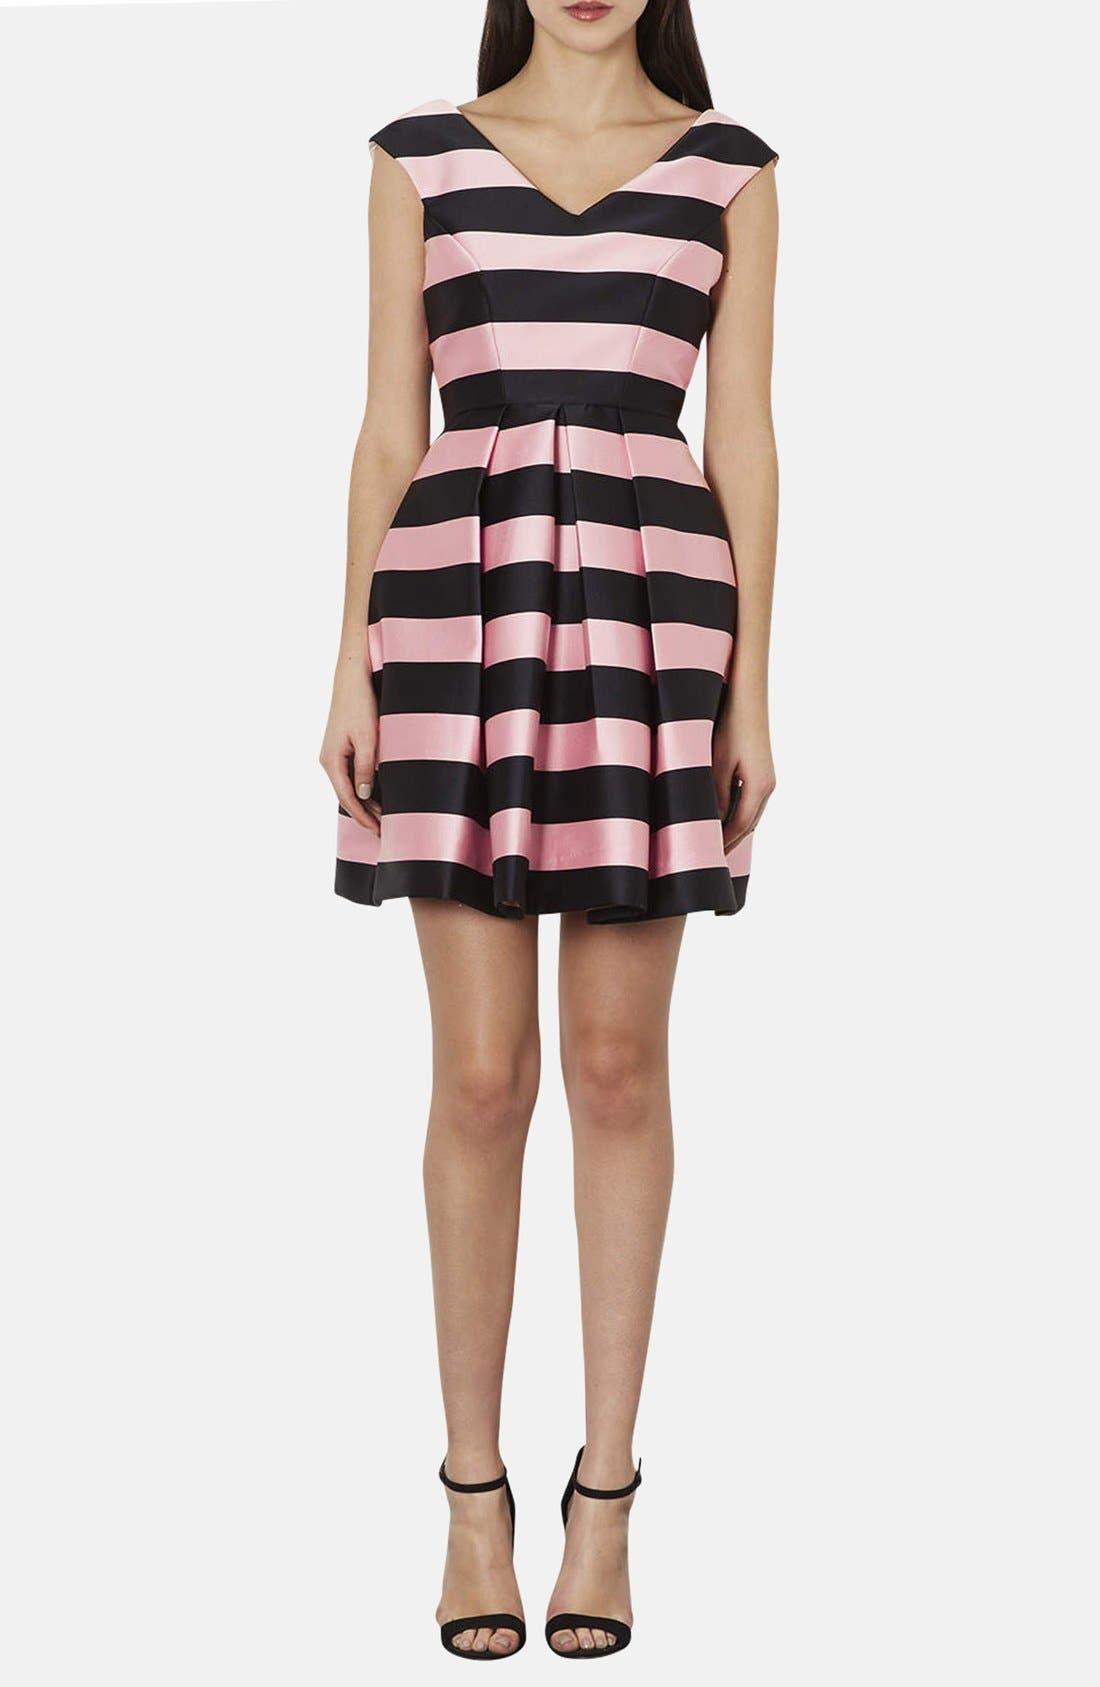 TOPSHOP, Stripe Satin Fit & Flare Dress, Main thumbnail 1, color, 001